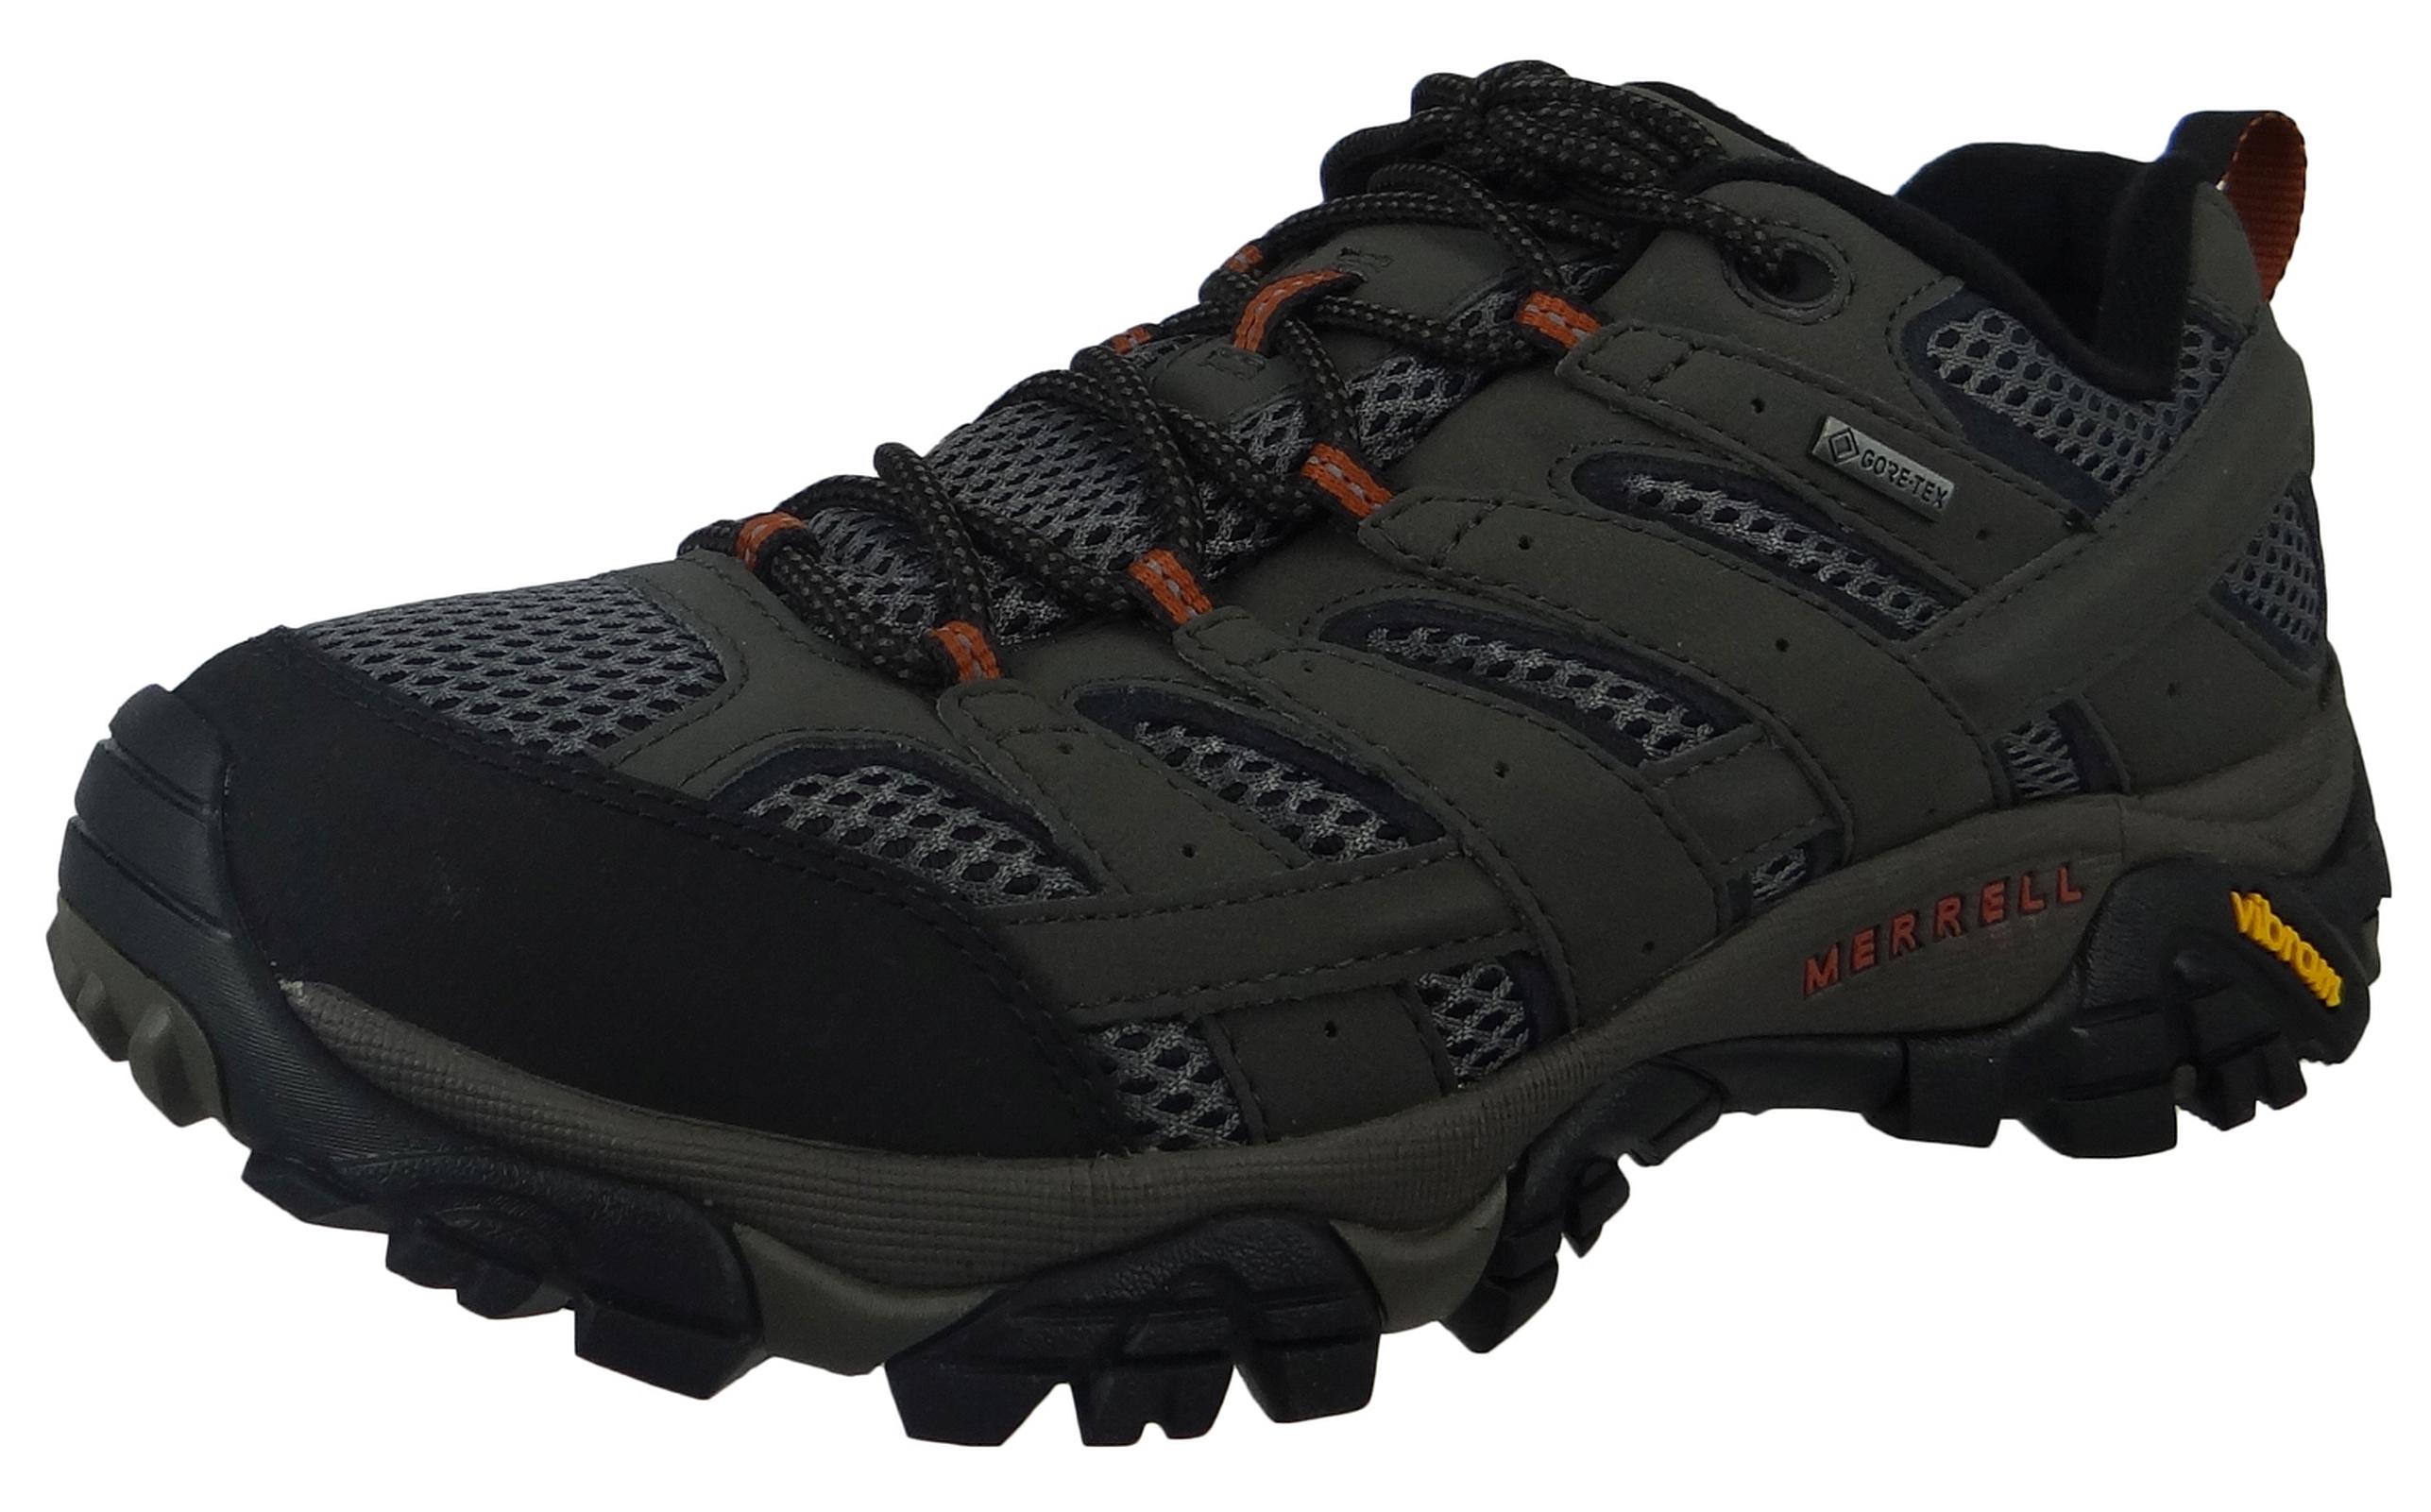 Merrell Moab 2 GTX J06039 Herren Hikingschuh Beluga Grau | Schuhkings Schuhe von den Königen